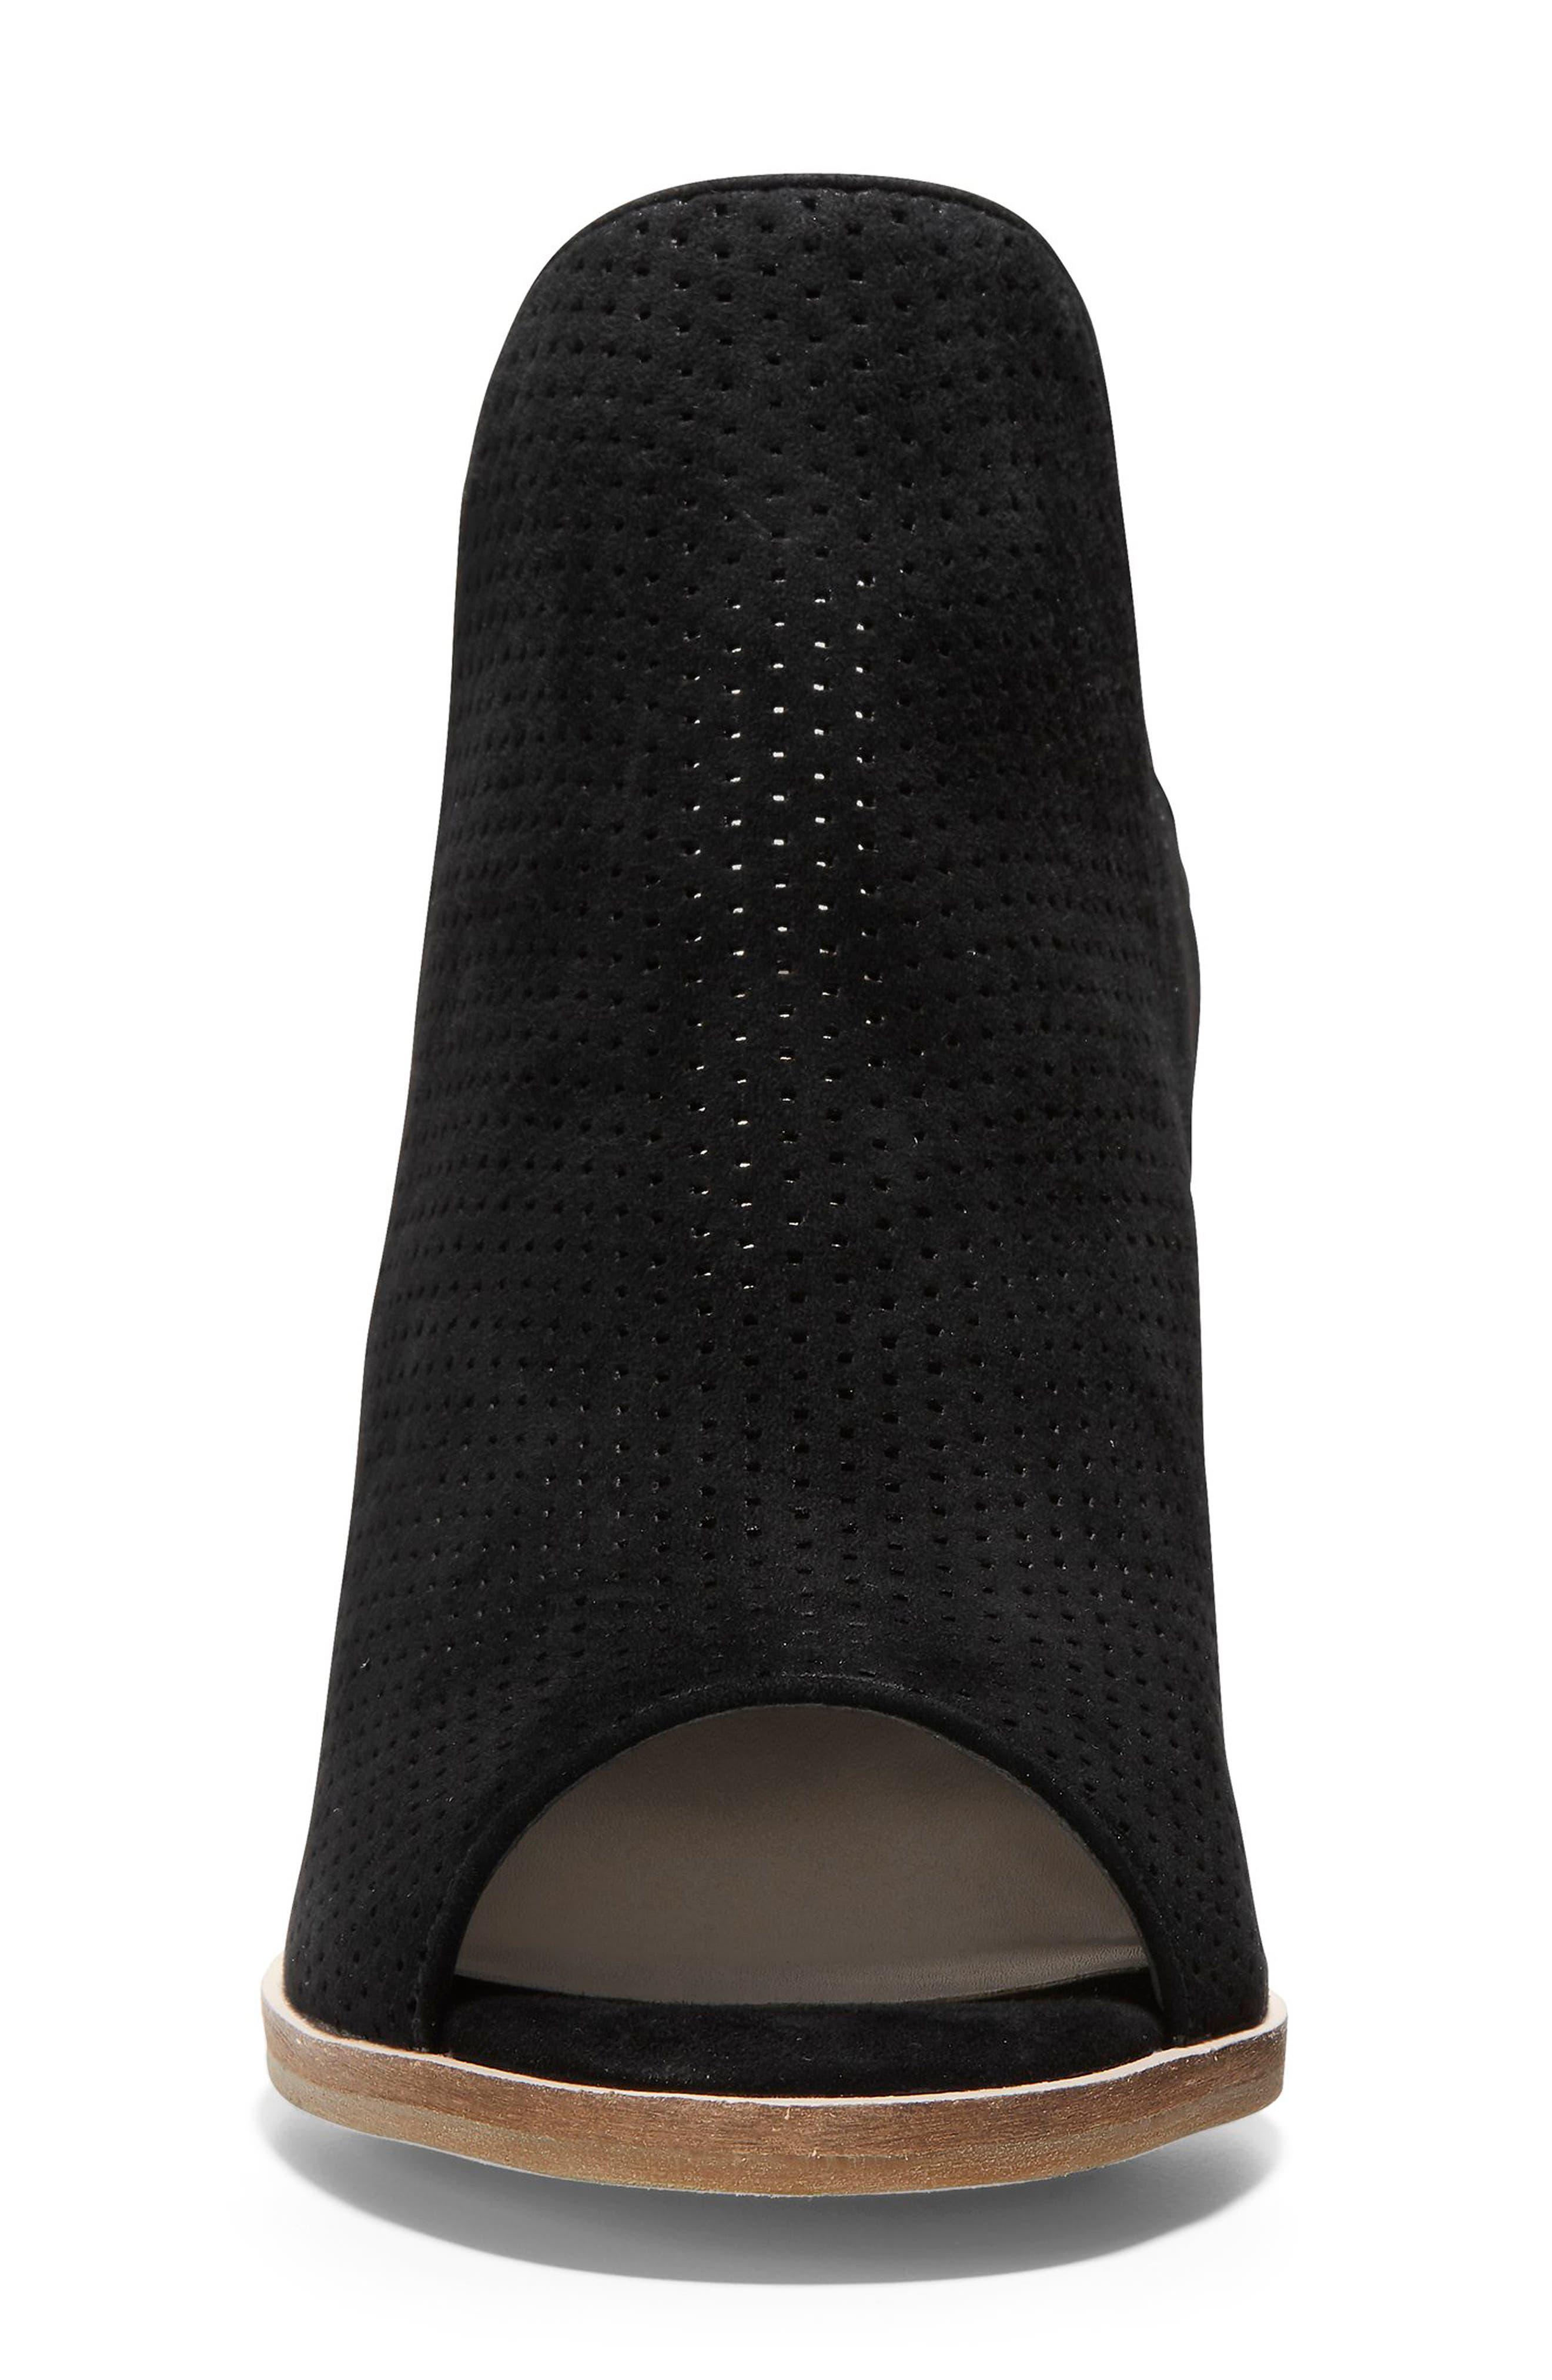 Callista Perforated Slingback Sandal,                             Alternate thumbnail 4, color,                             BLACK PERF SUEDE